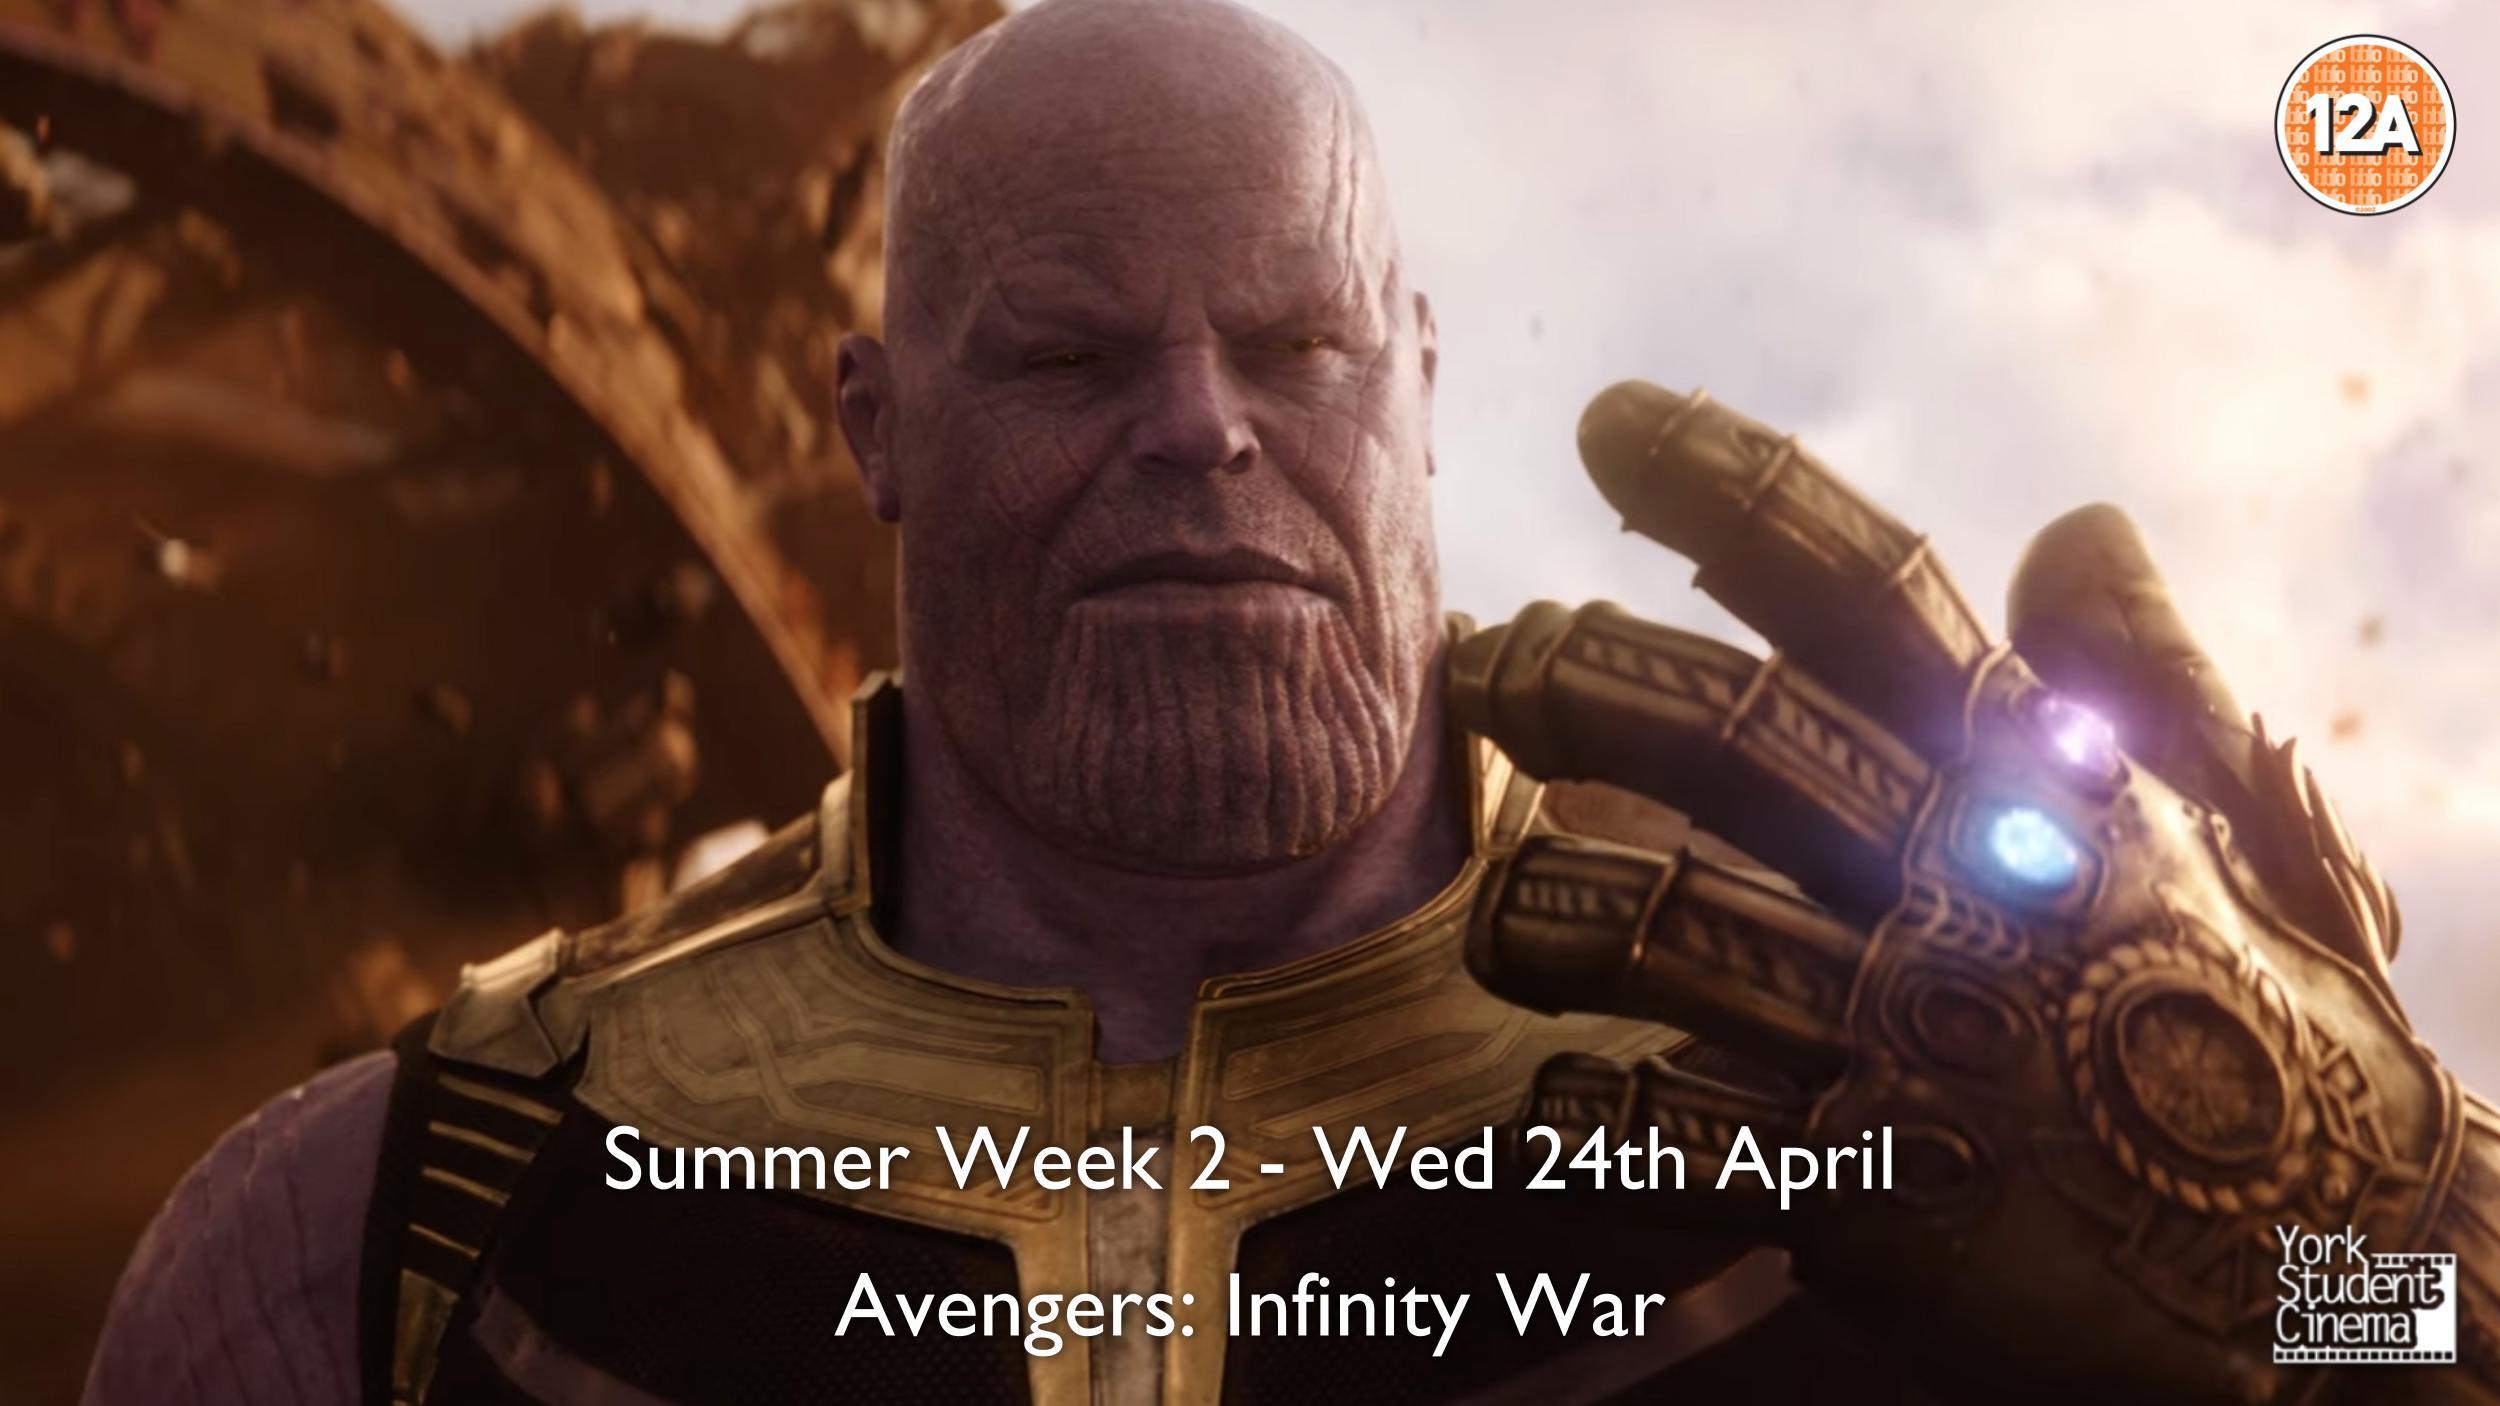 YSC Screening of Avengers: Infinity War